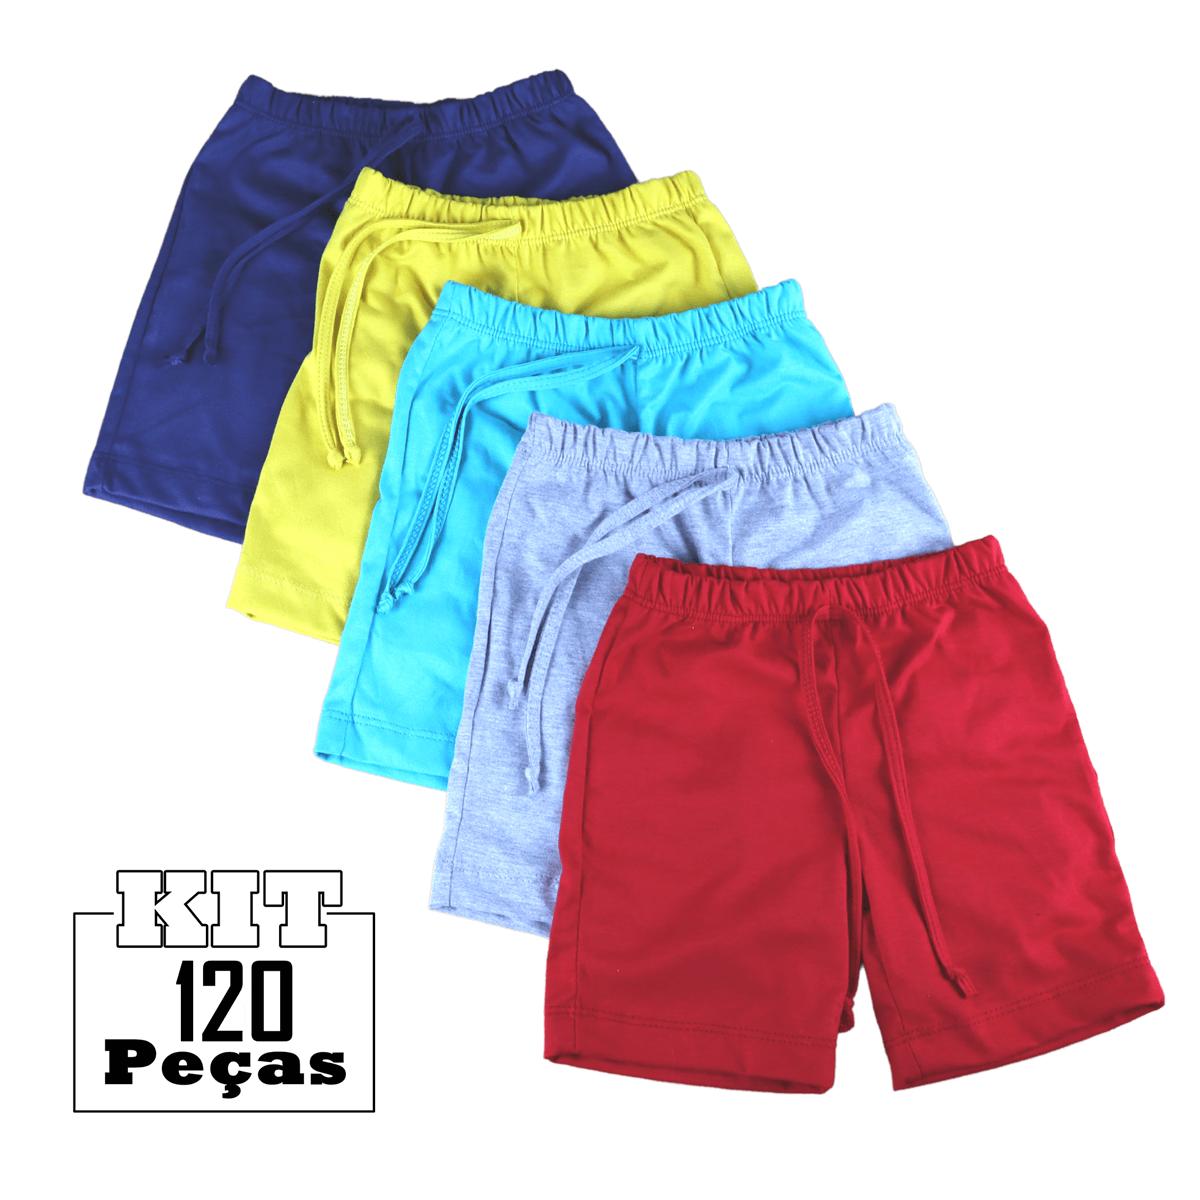 Kit 120 Shorts Bermuda Malha Bebê Menina Menino Atacado